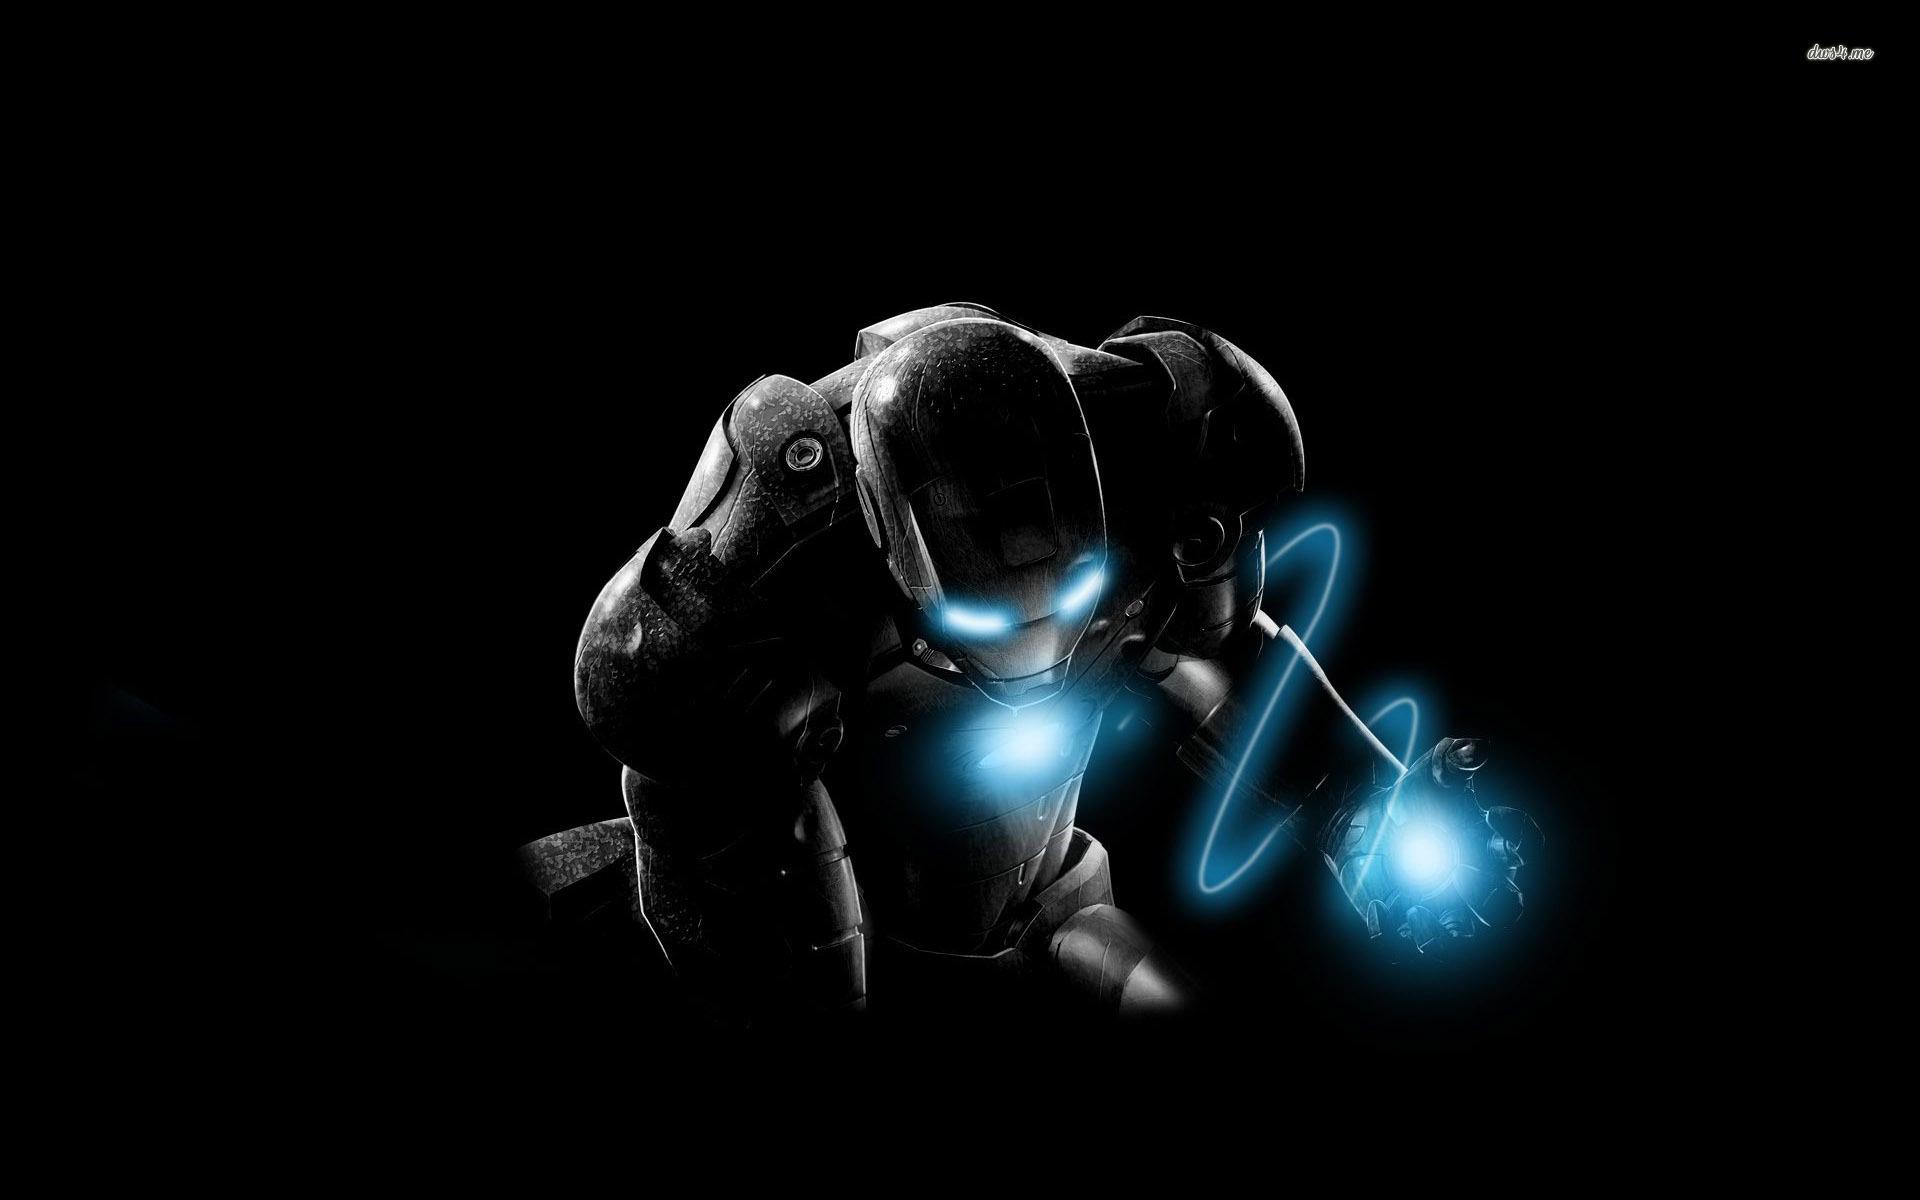 Rajesh 3d Name Wallpaper Download Iron Man Widescreen Wallpapers 06147 Baltana